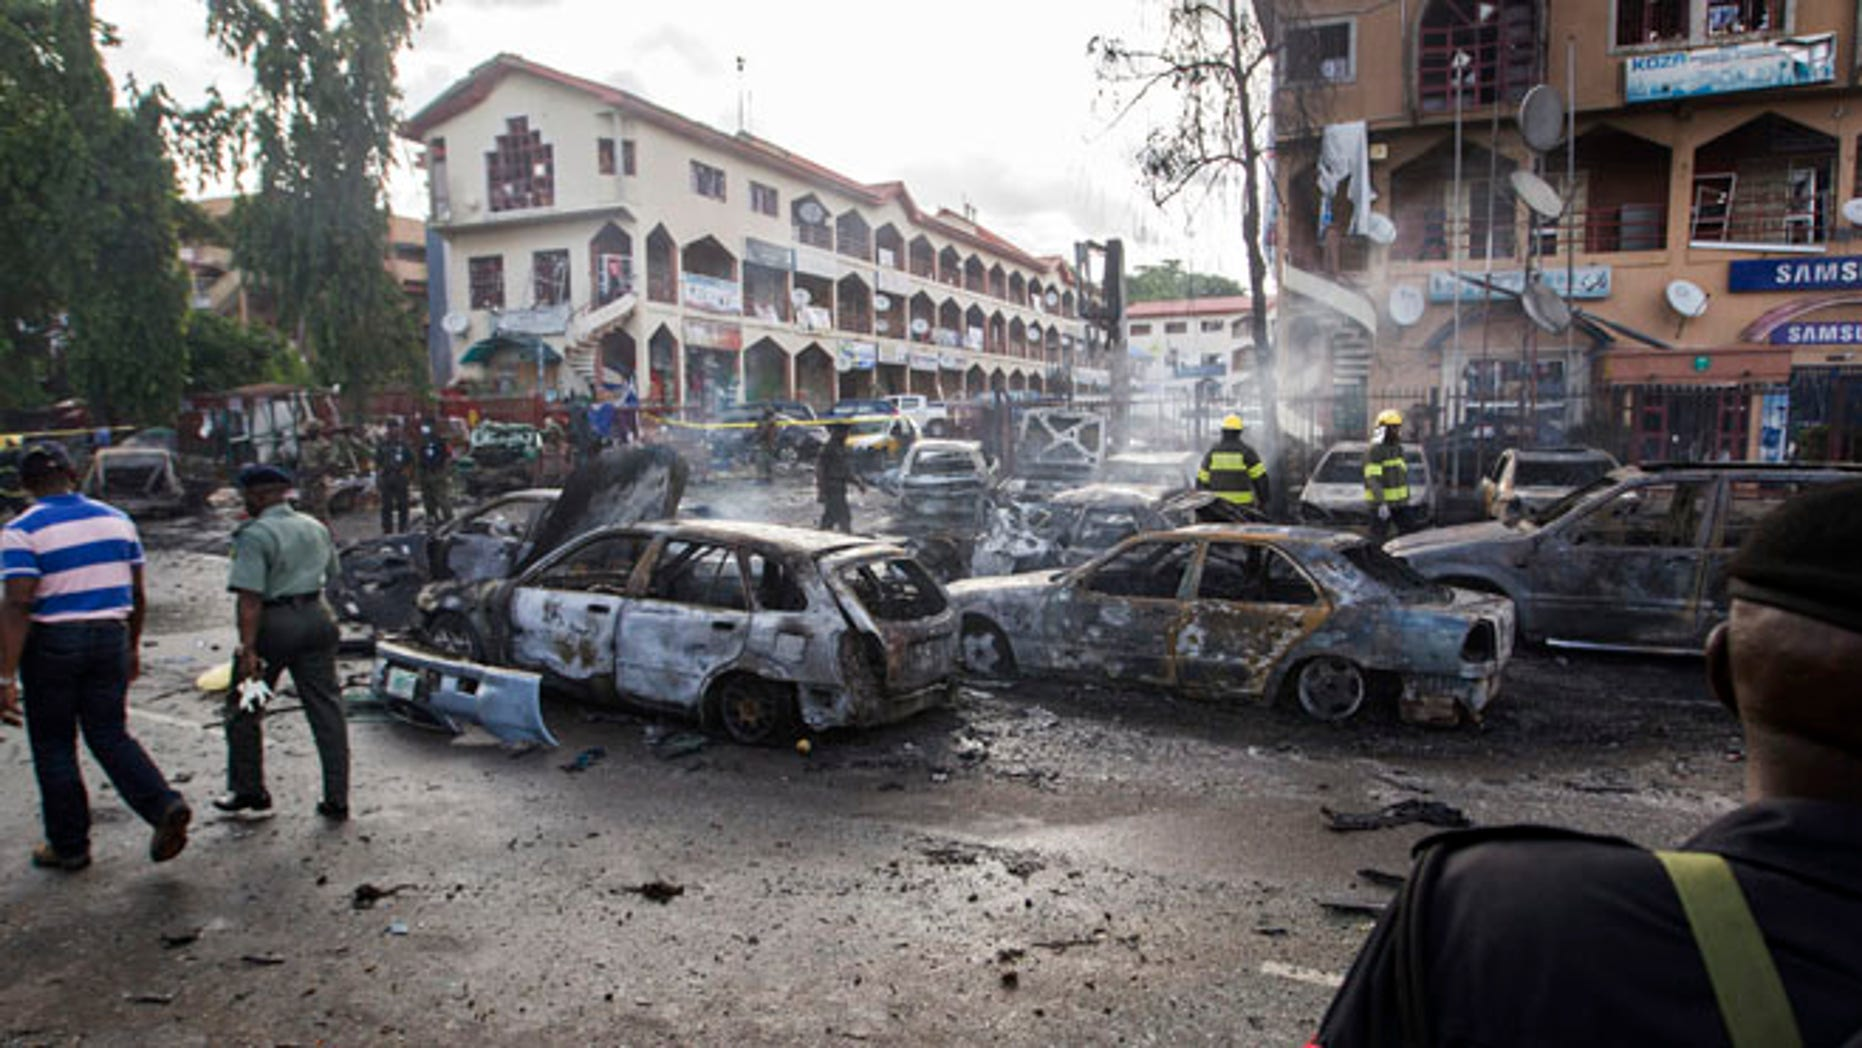 FILE: June 25, 2014: The terror group Boko Haram has taken credit for this fatal bomb blast in Abuja, Nigeria.